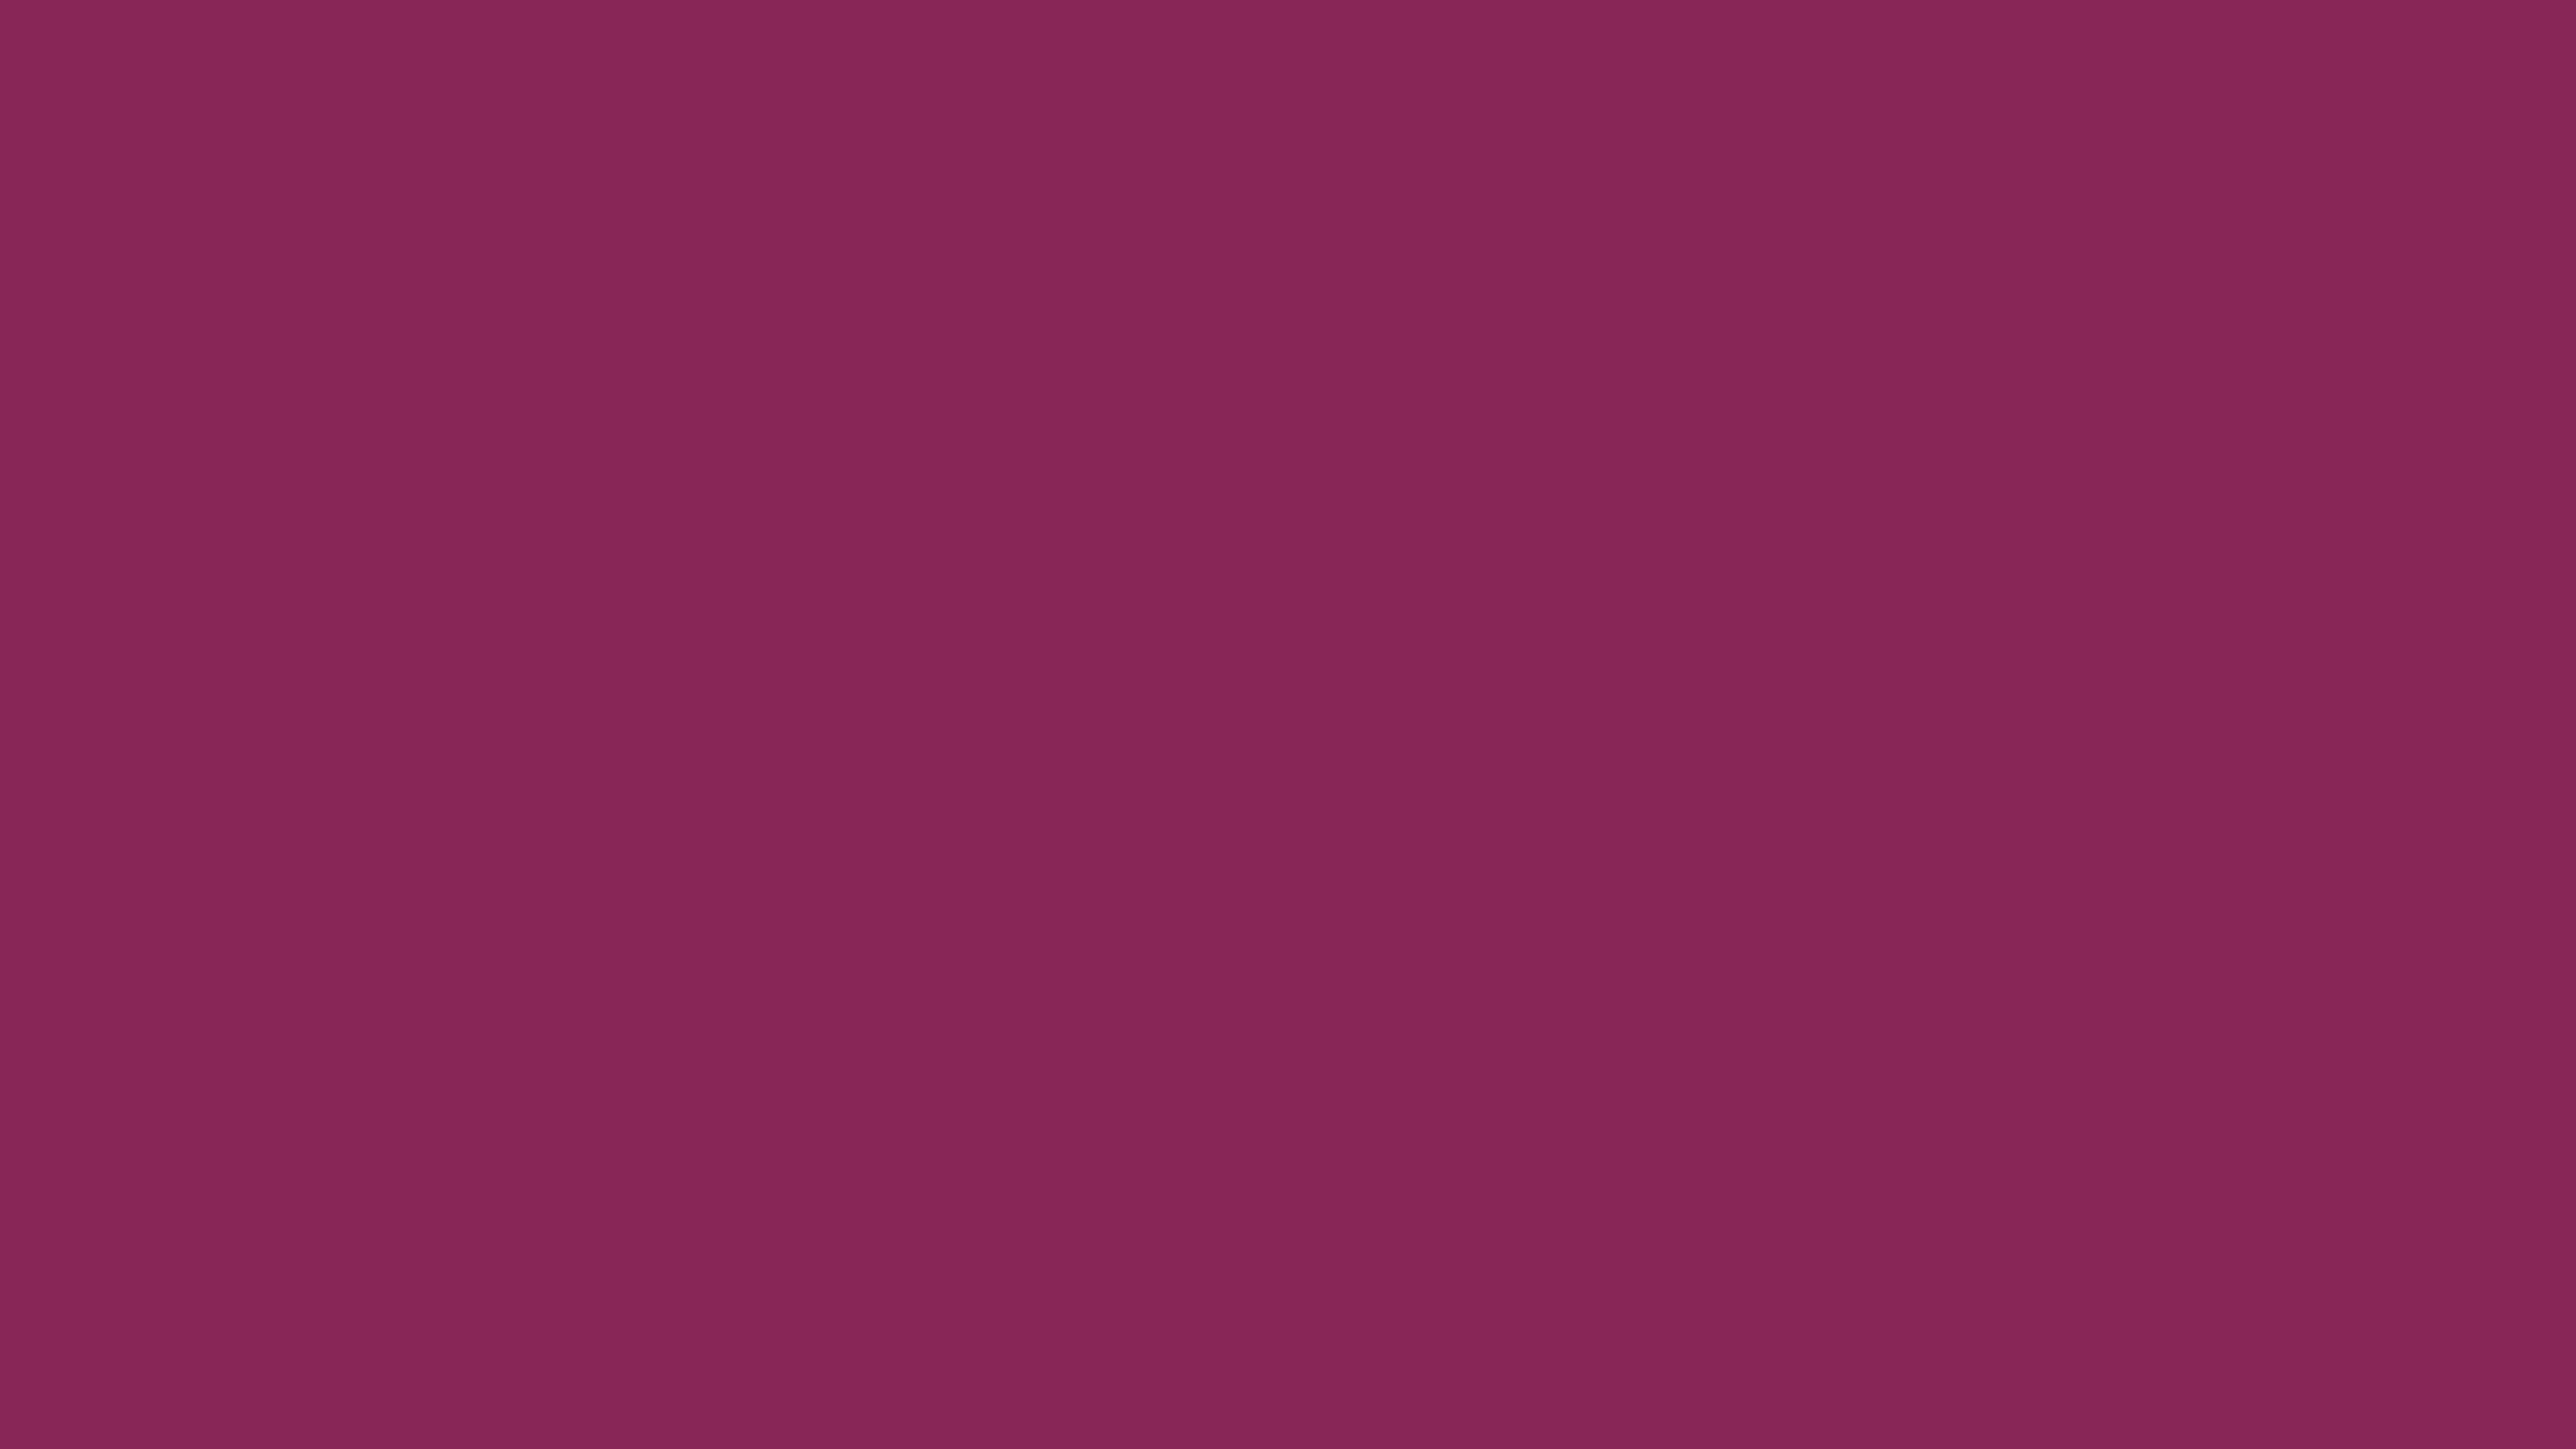 5120x2880 Dark Raspberry Solid Color Background